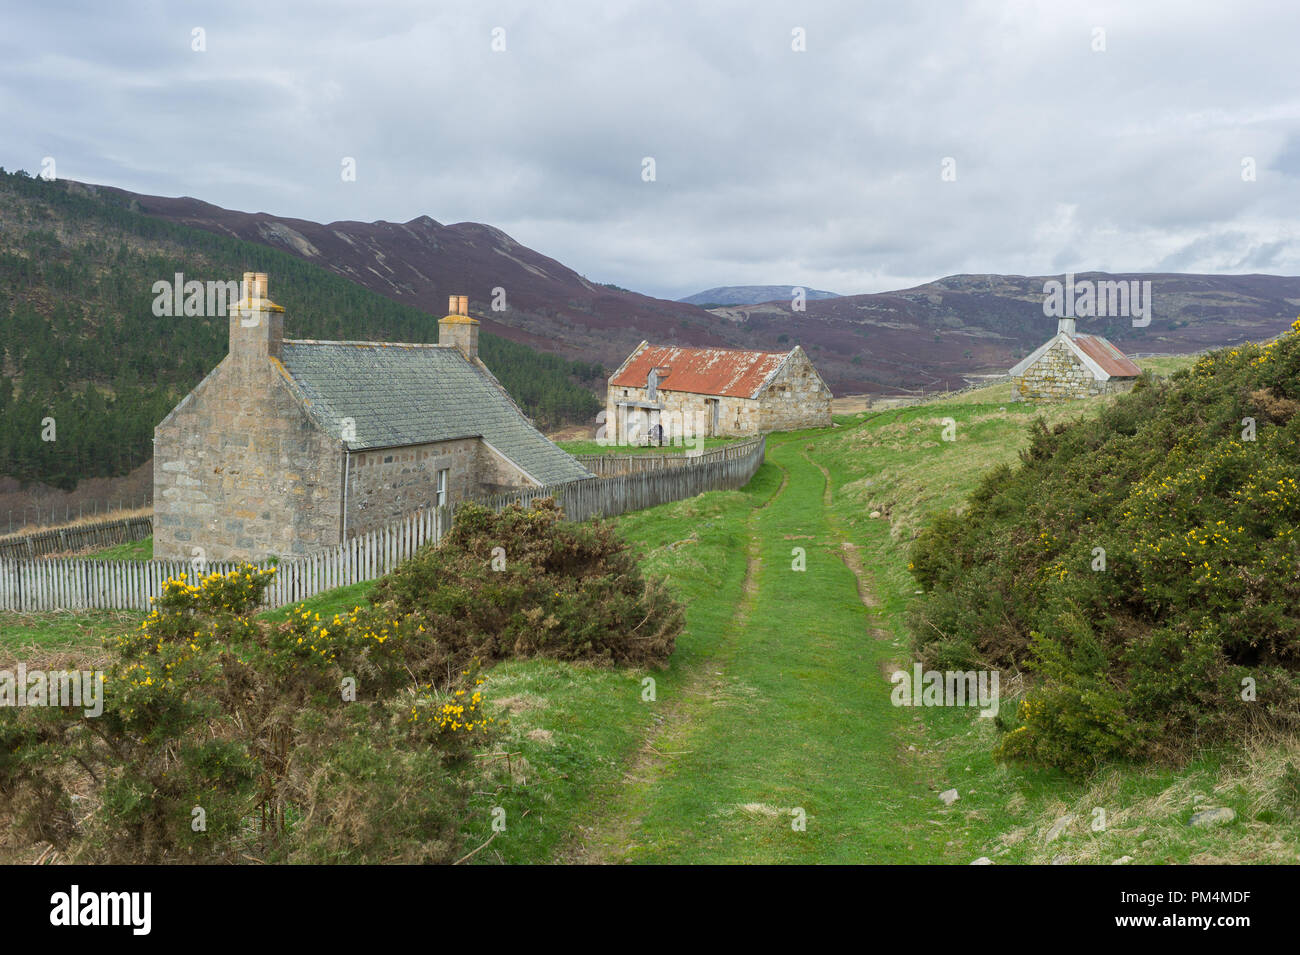 Former farmstead at Auchtavan on the Invercauld estate near Braemar Scotland. - Stock Image